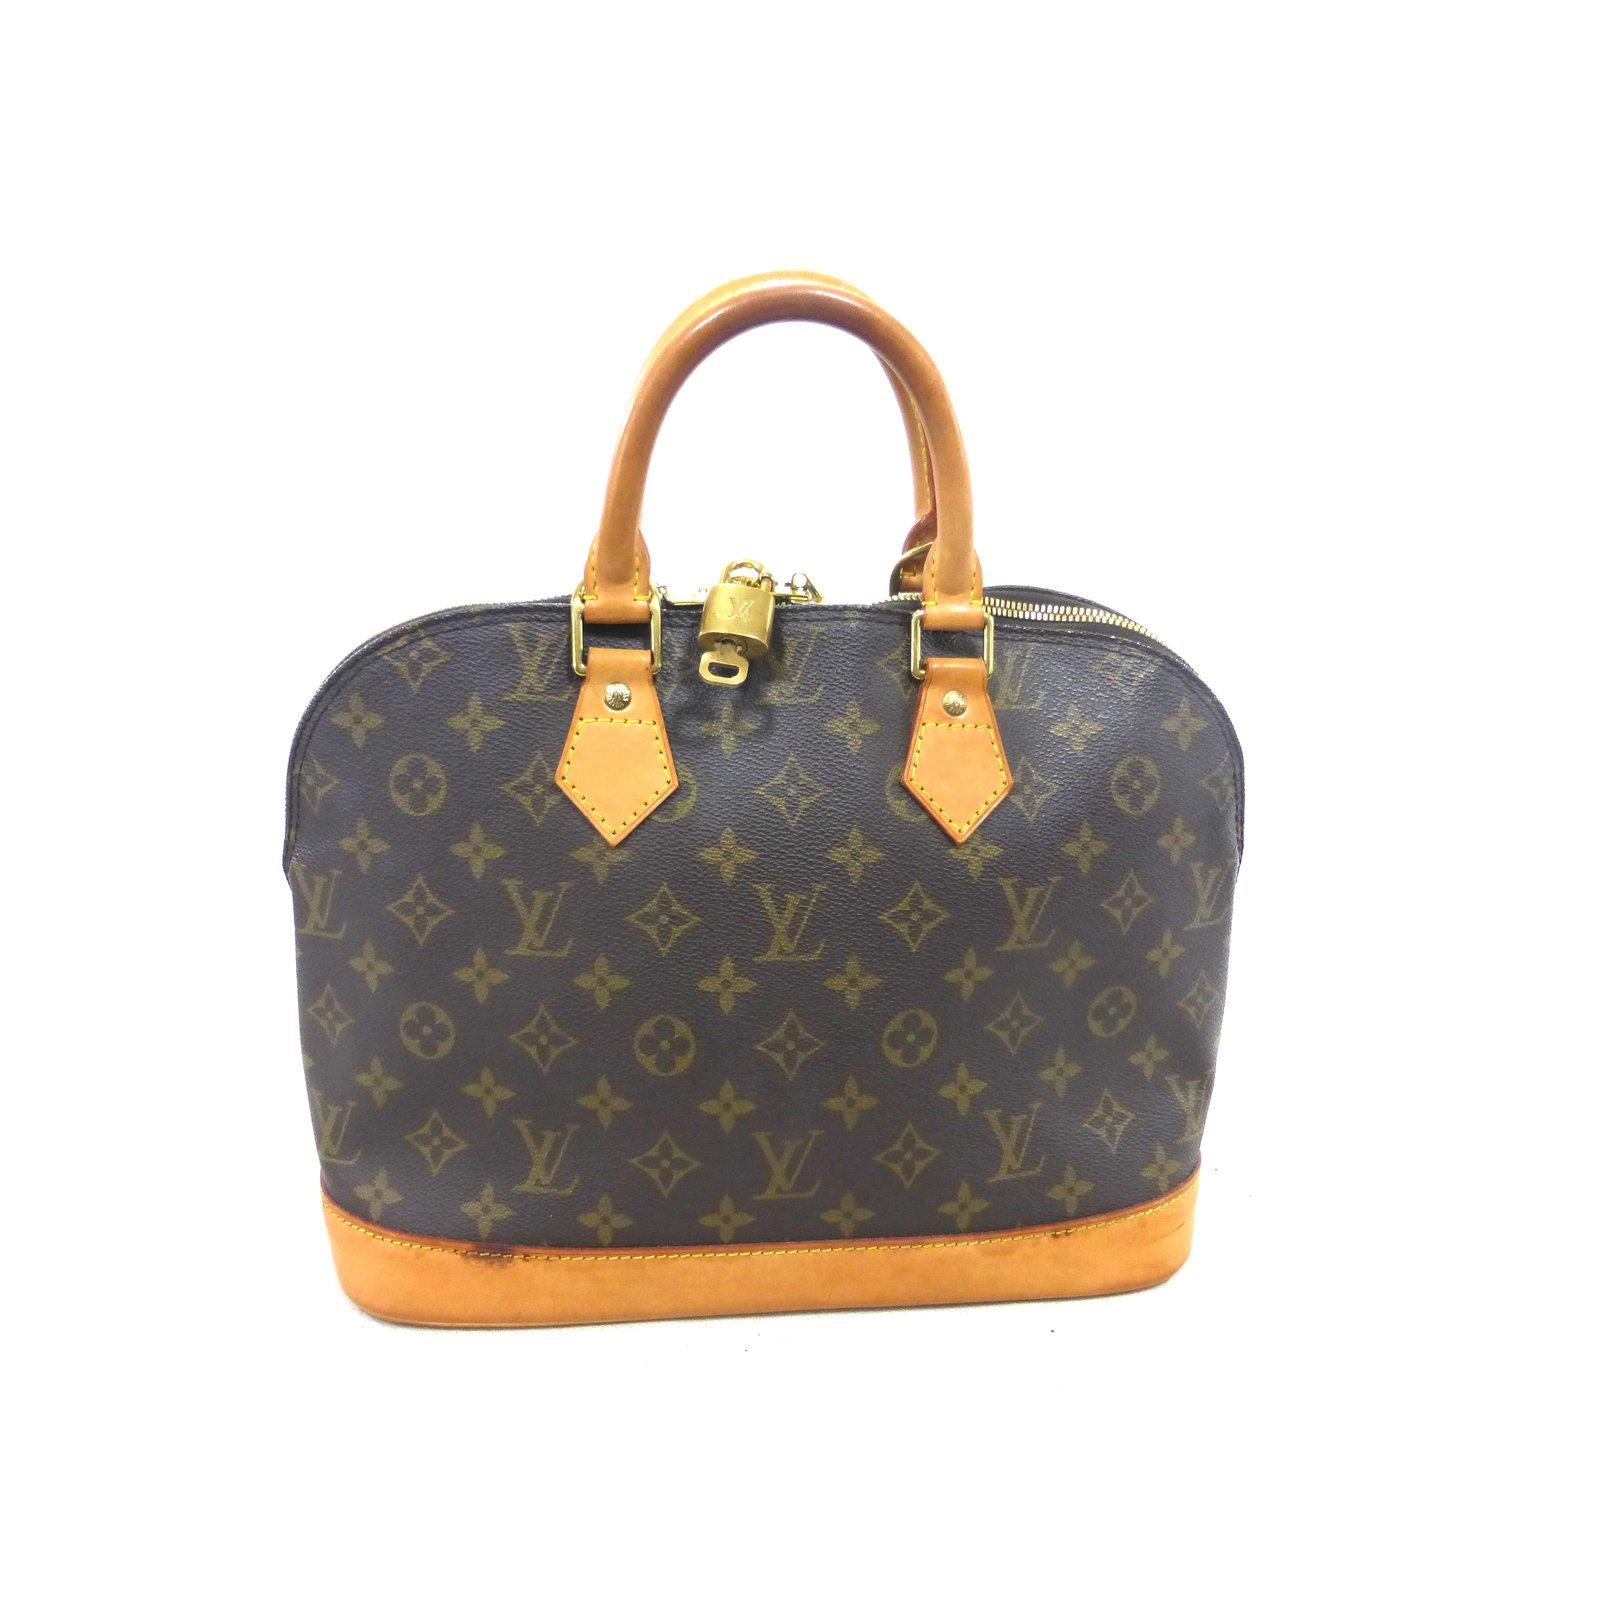 e25c4d75f7f1 Louis Vuitton ALMA MONOGRAM Handbags Leather Brown ref.111452 - Joli ...